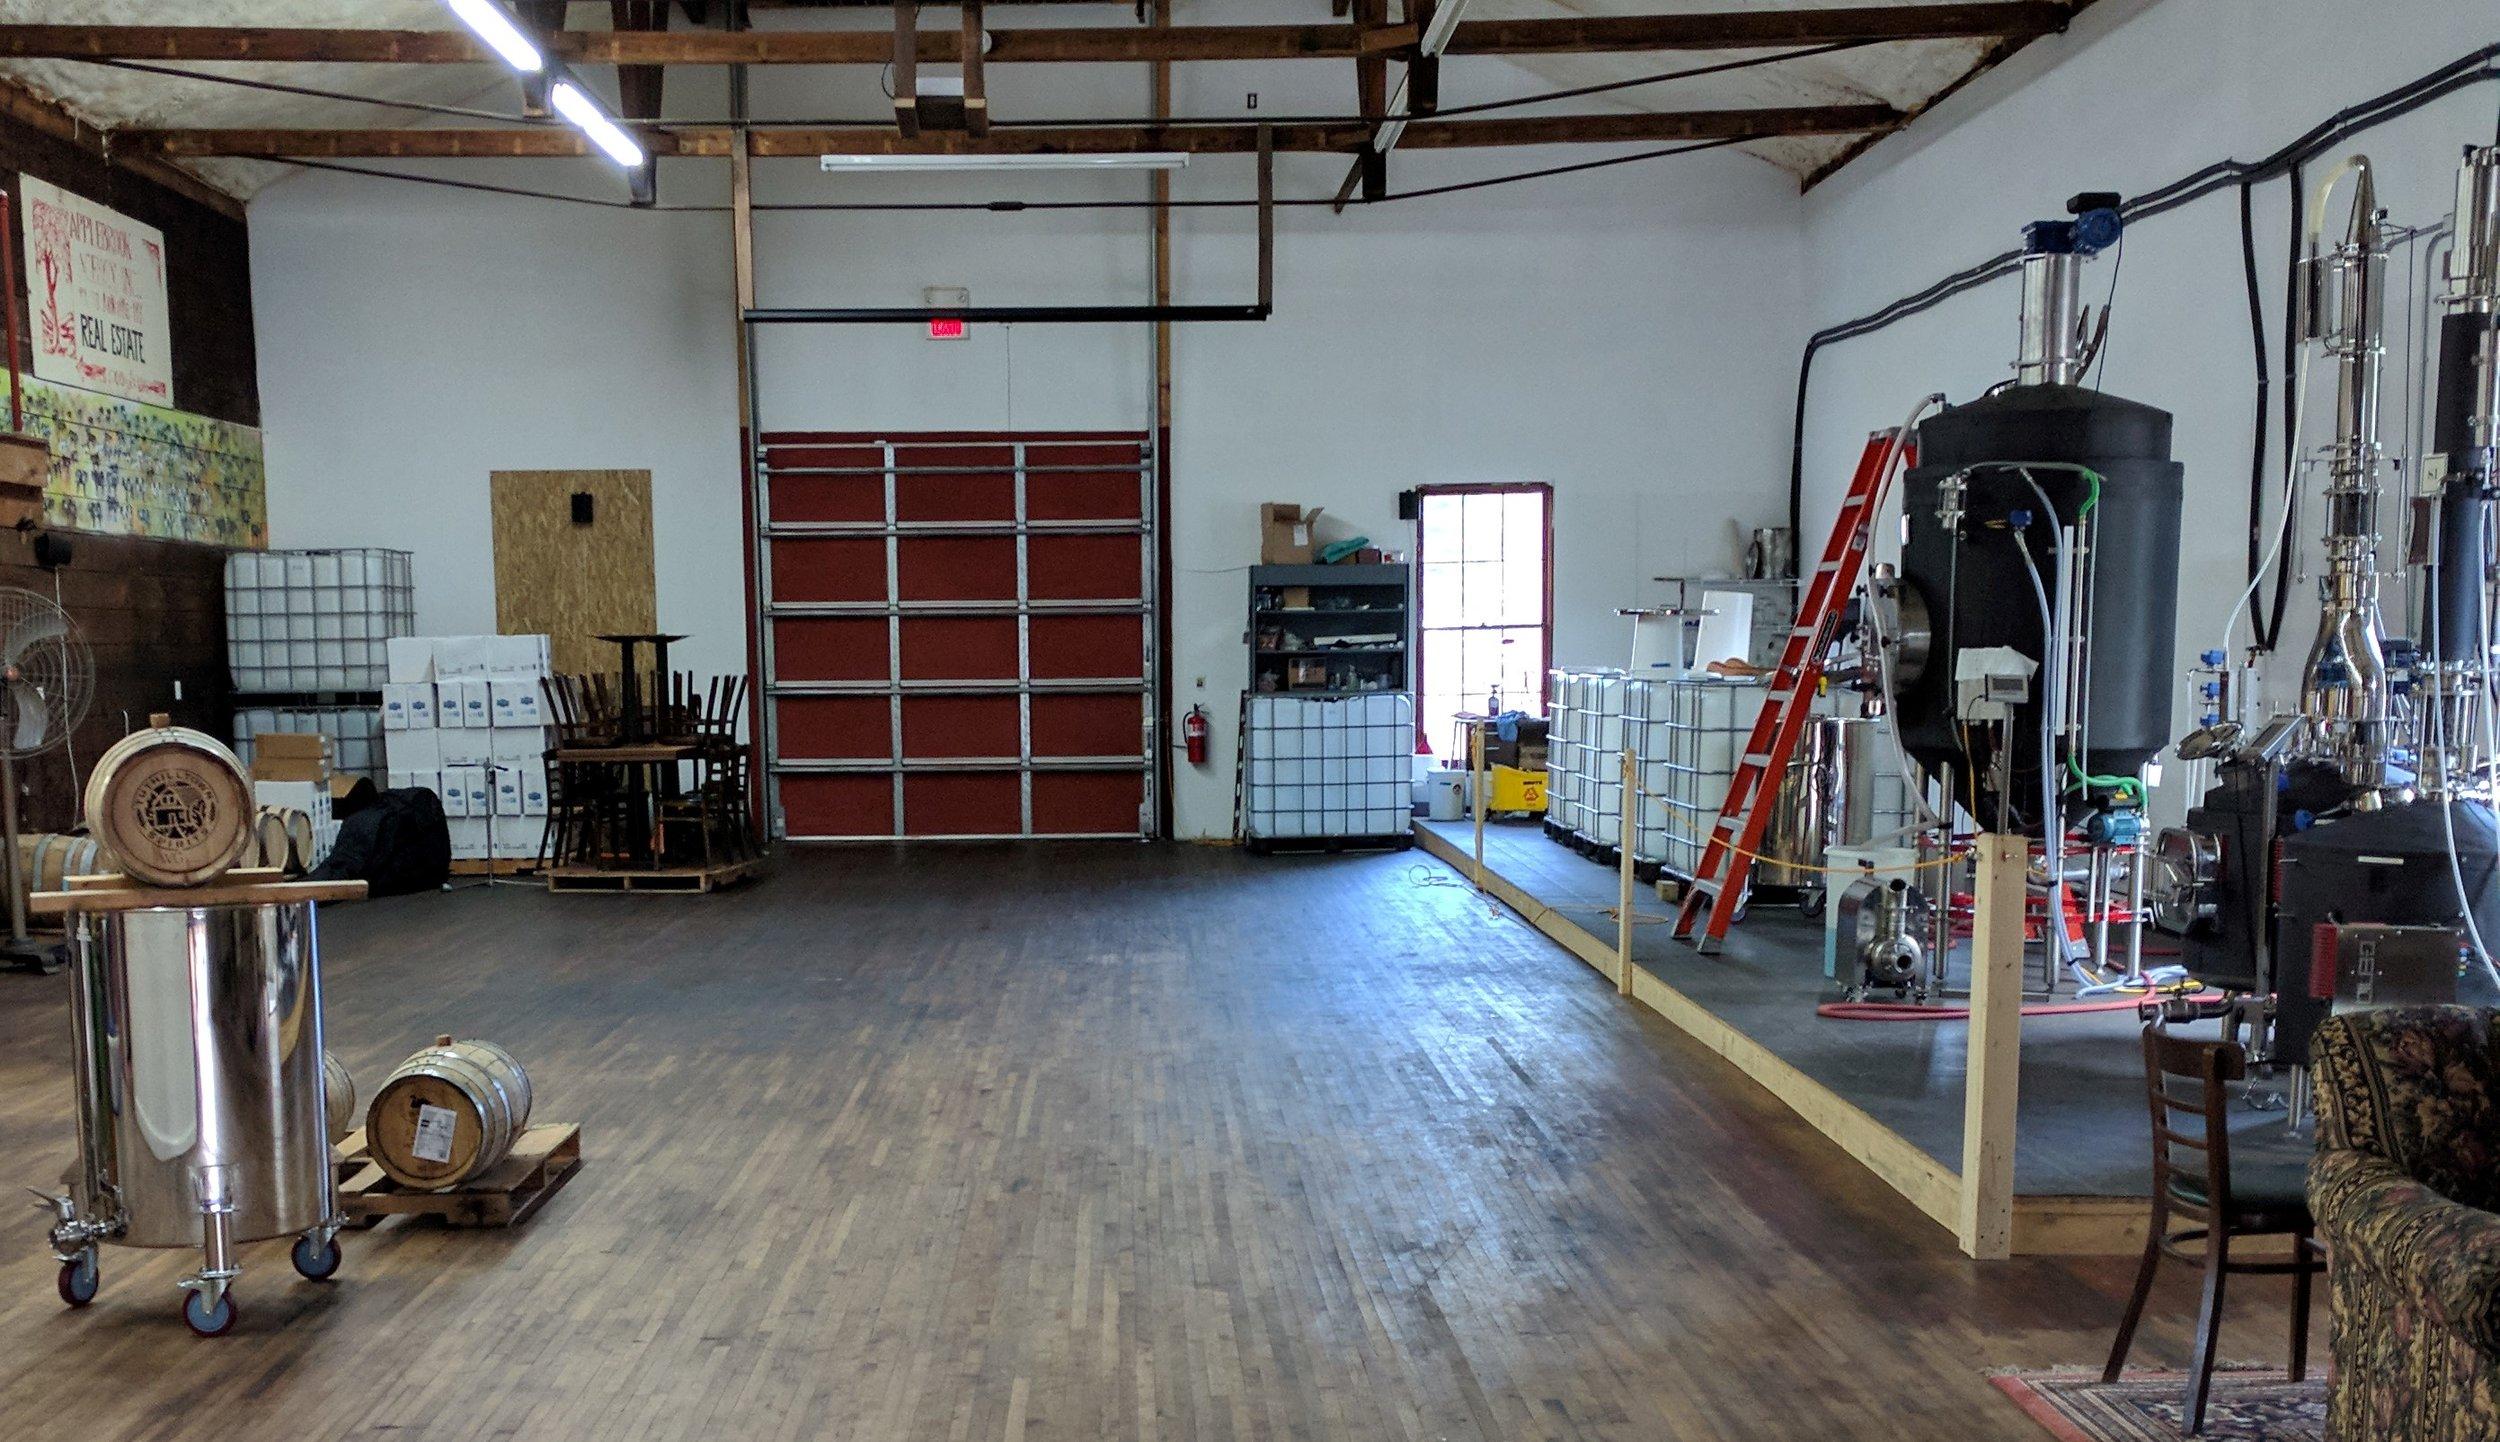 Peering into the distillery room